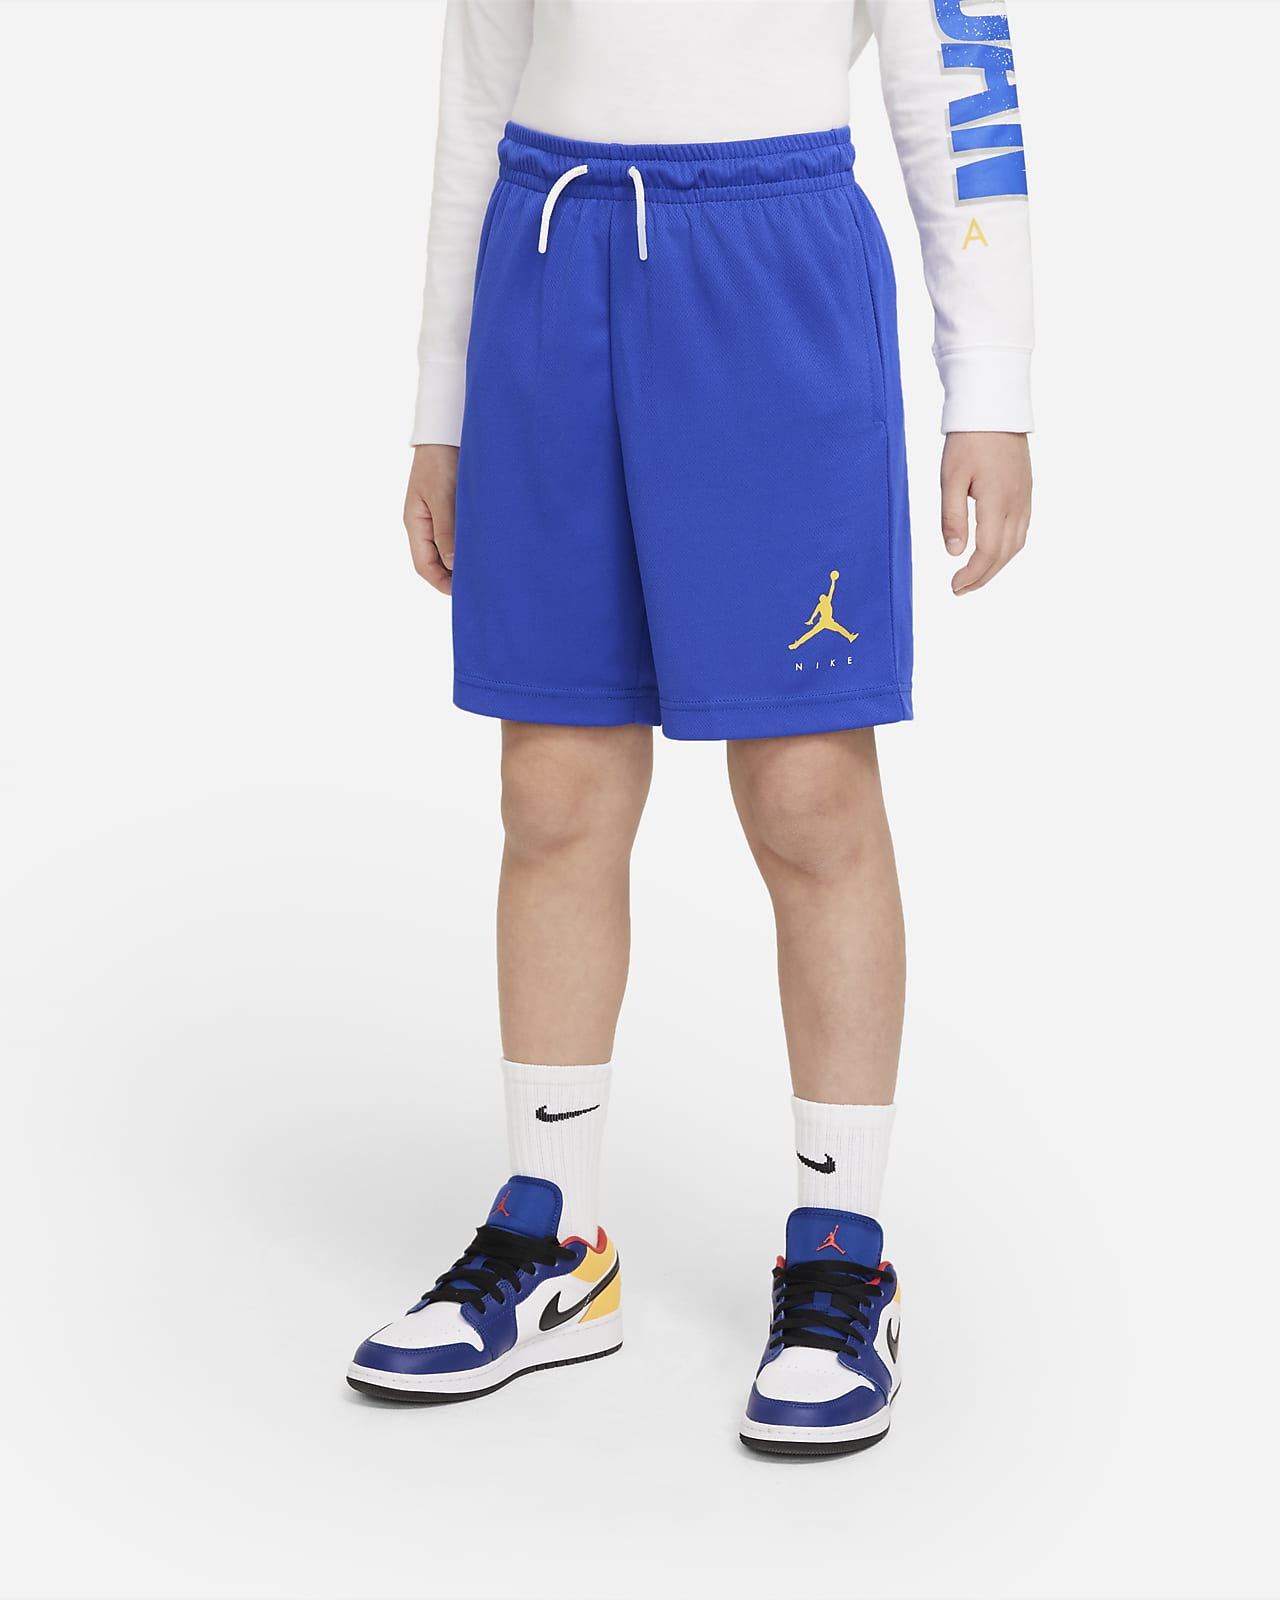 Jordan Mesh-Shorts für ältere Kinder (Jungen)